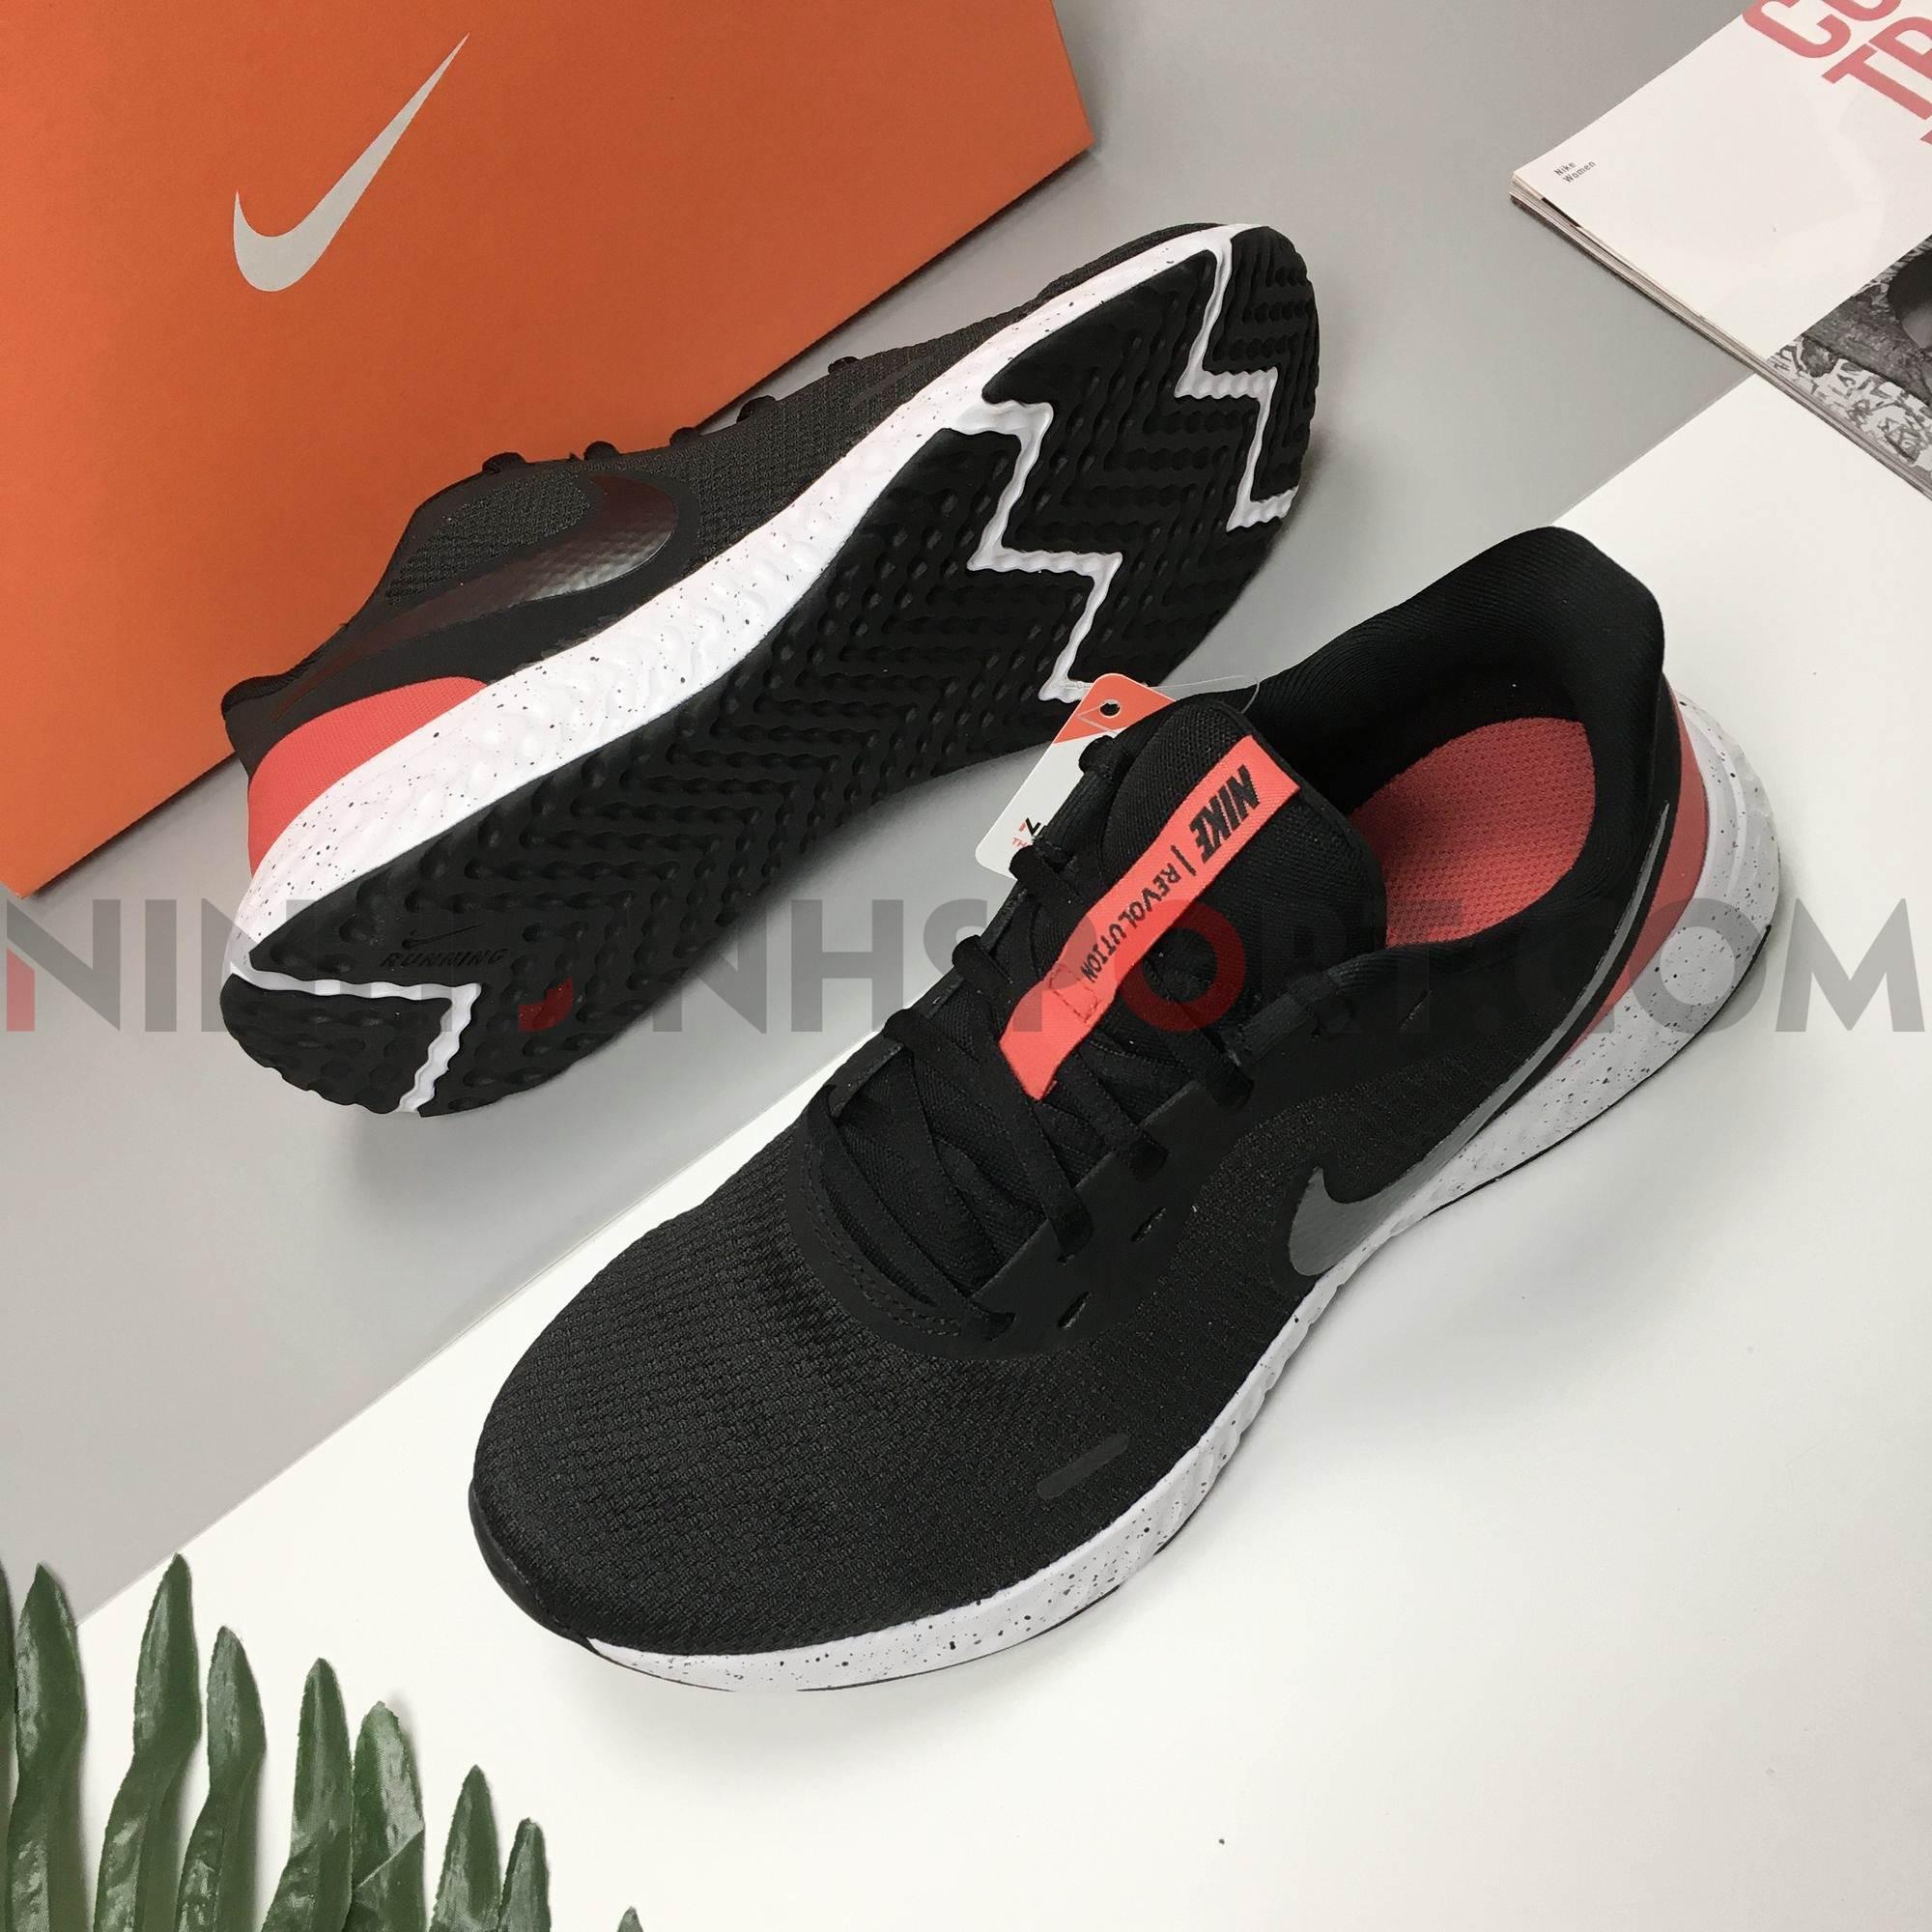 Giầy thể thao nam Nike Revolution 5 BQ3204-003